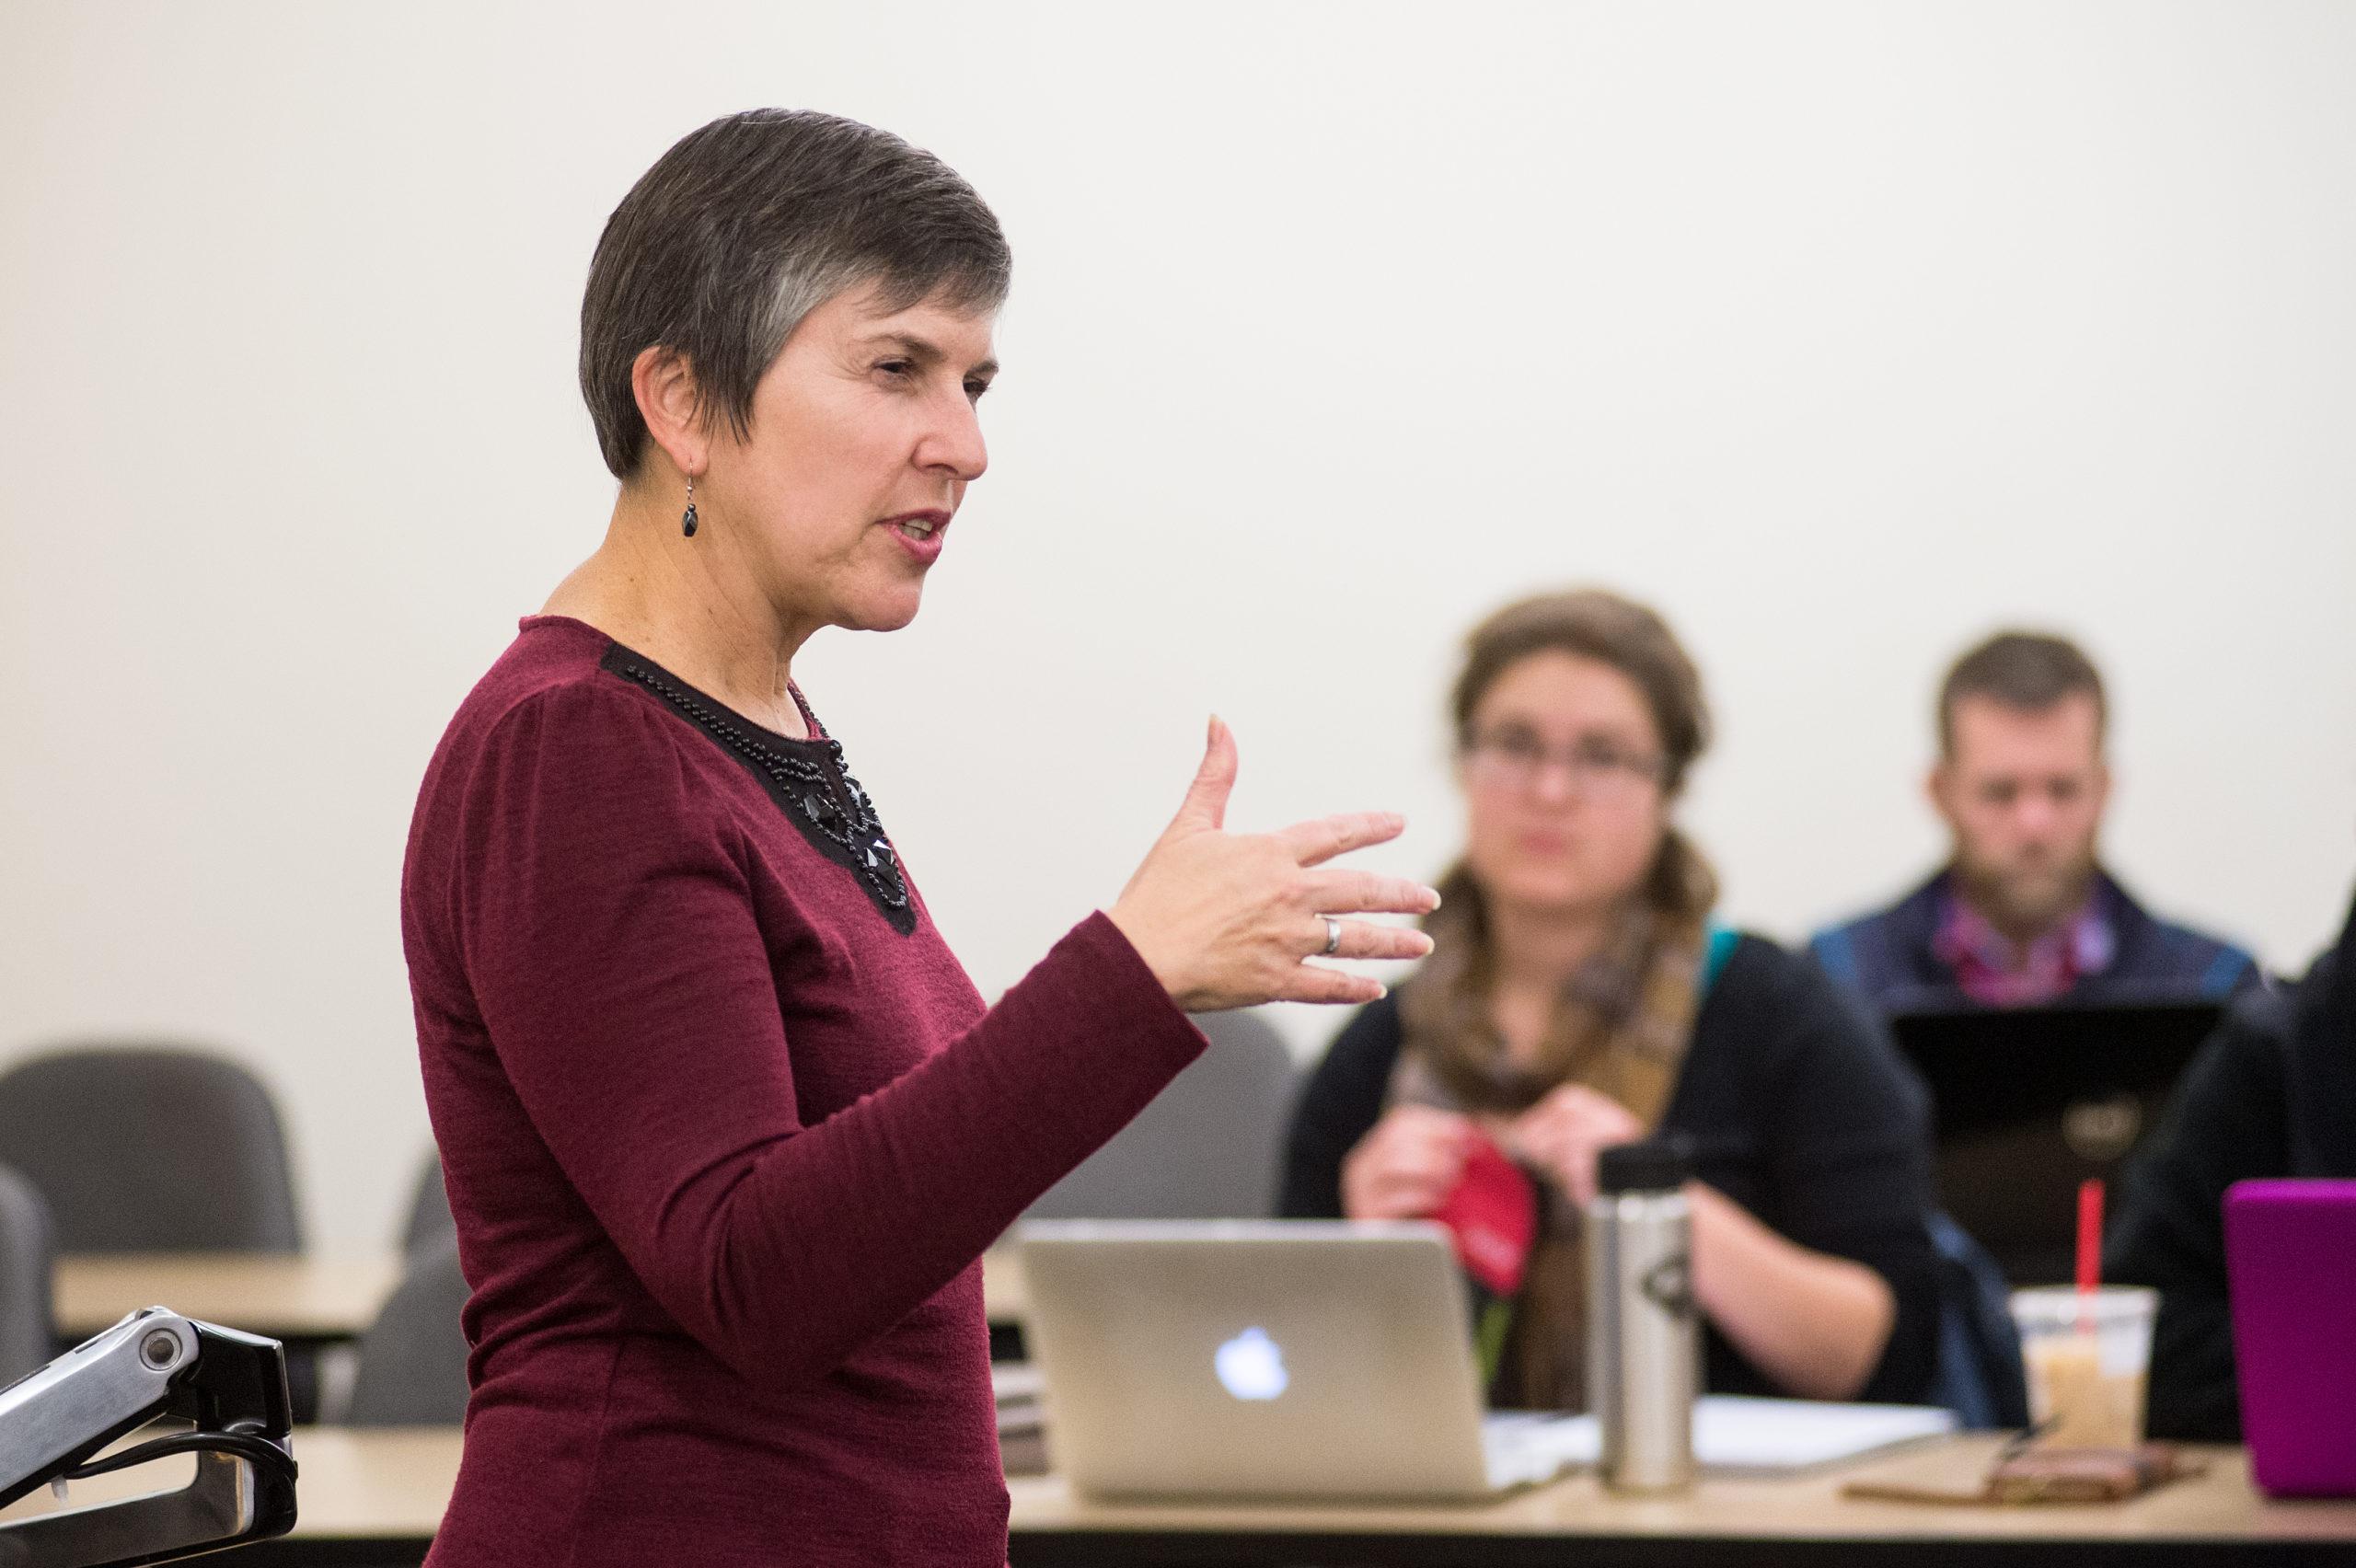 female professor speaking to class